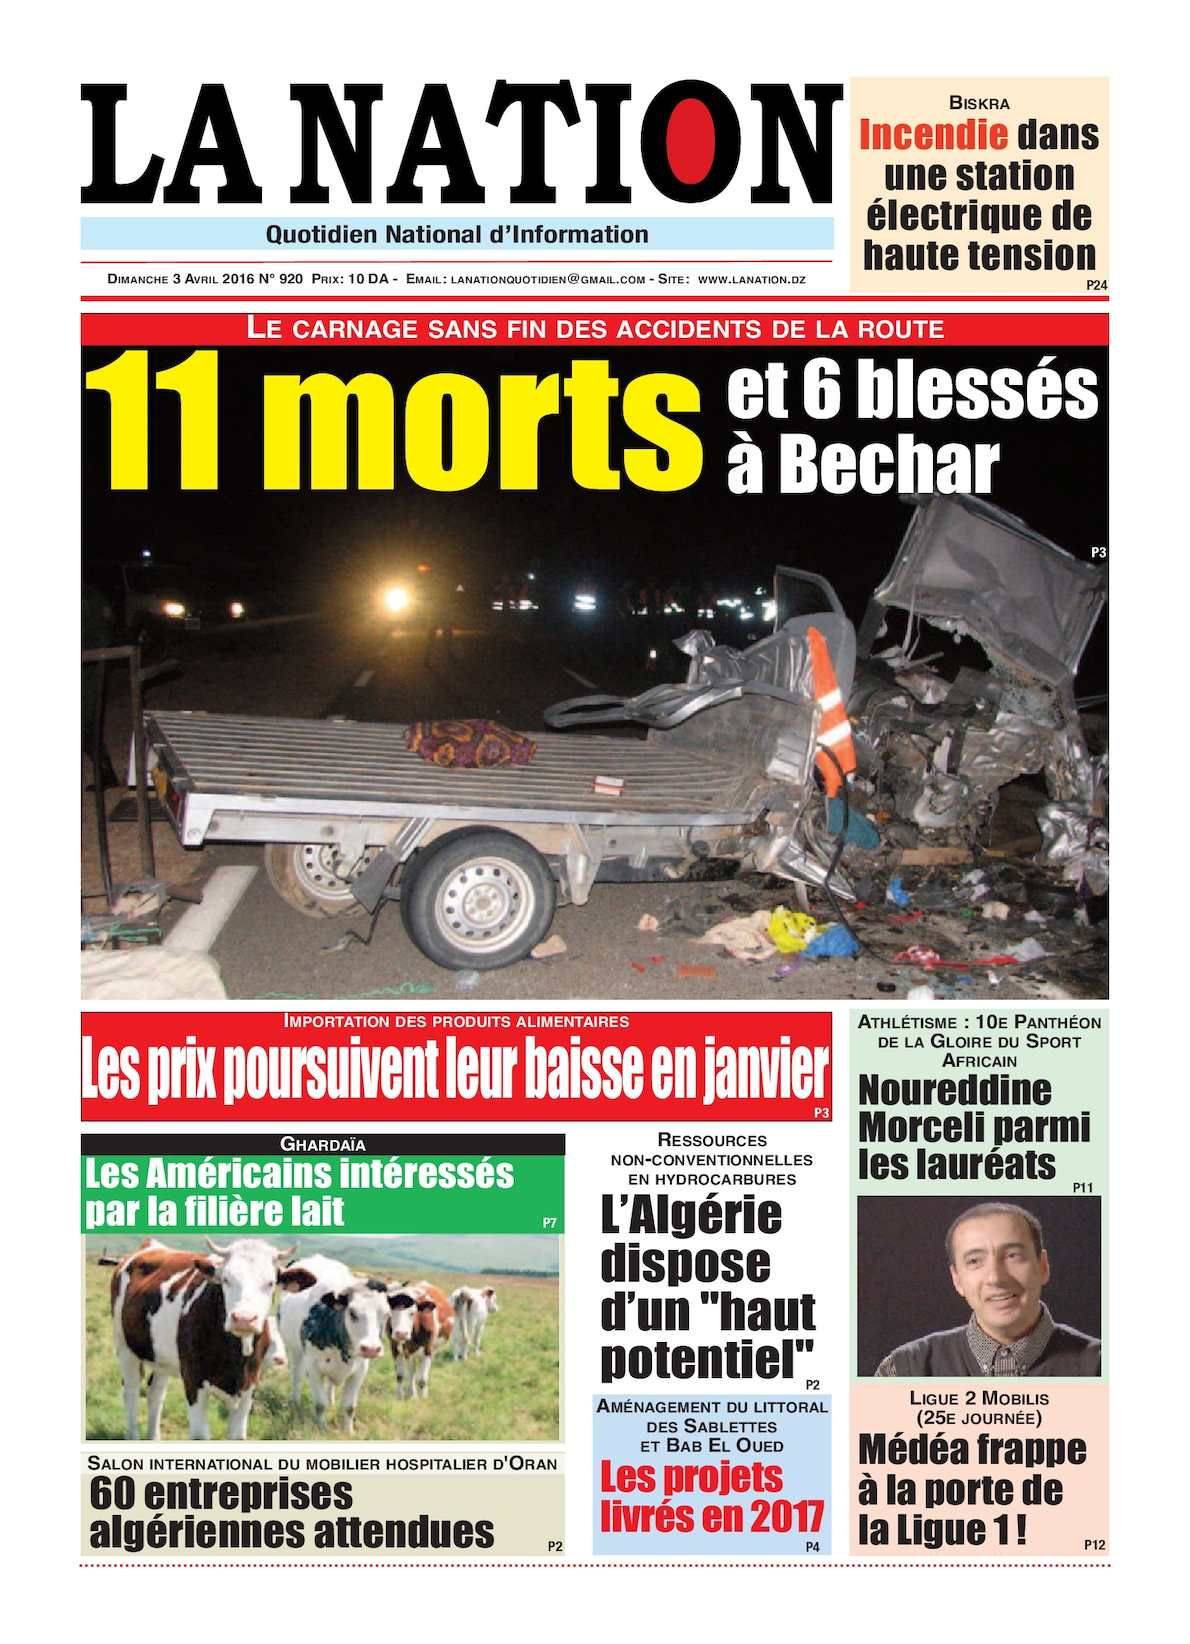 La Nation Edition N 920